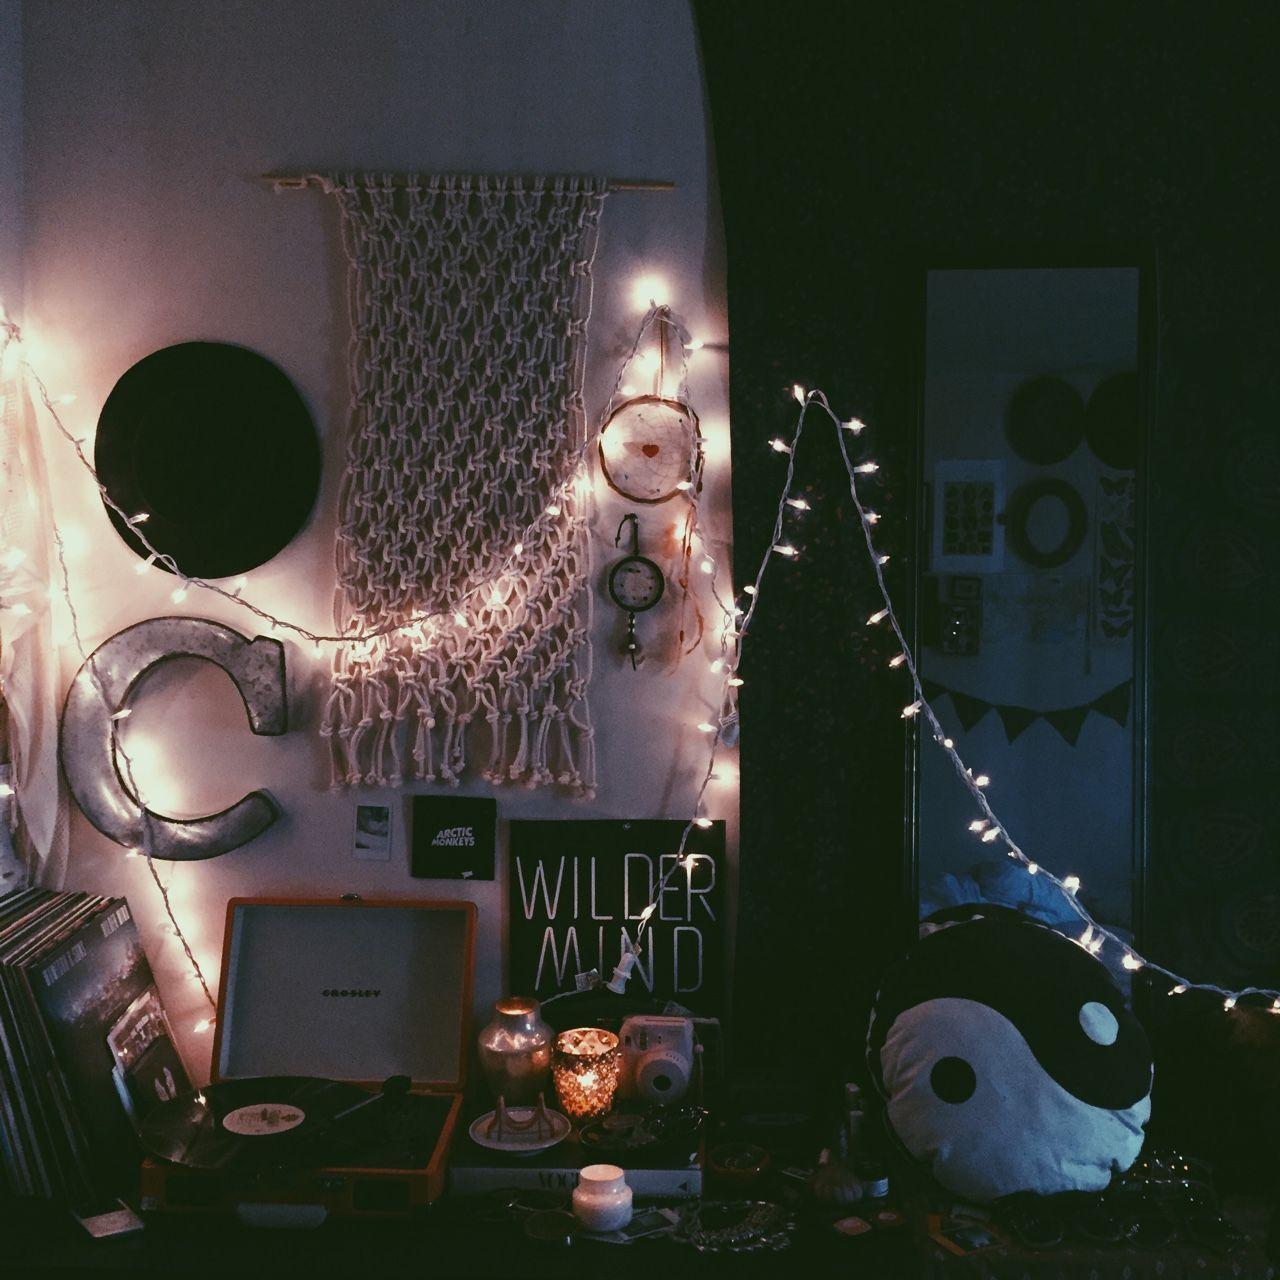 Pin by Megan Webbb on •tumblr• | Yin yang, Dream catcher ...